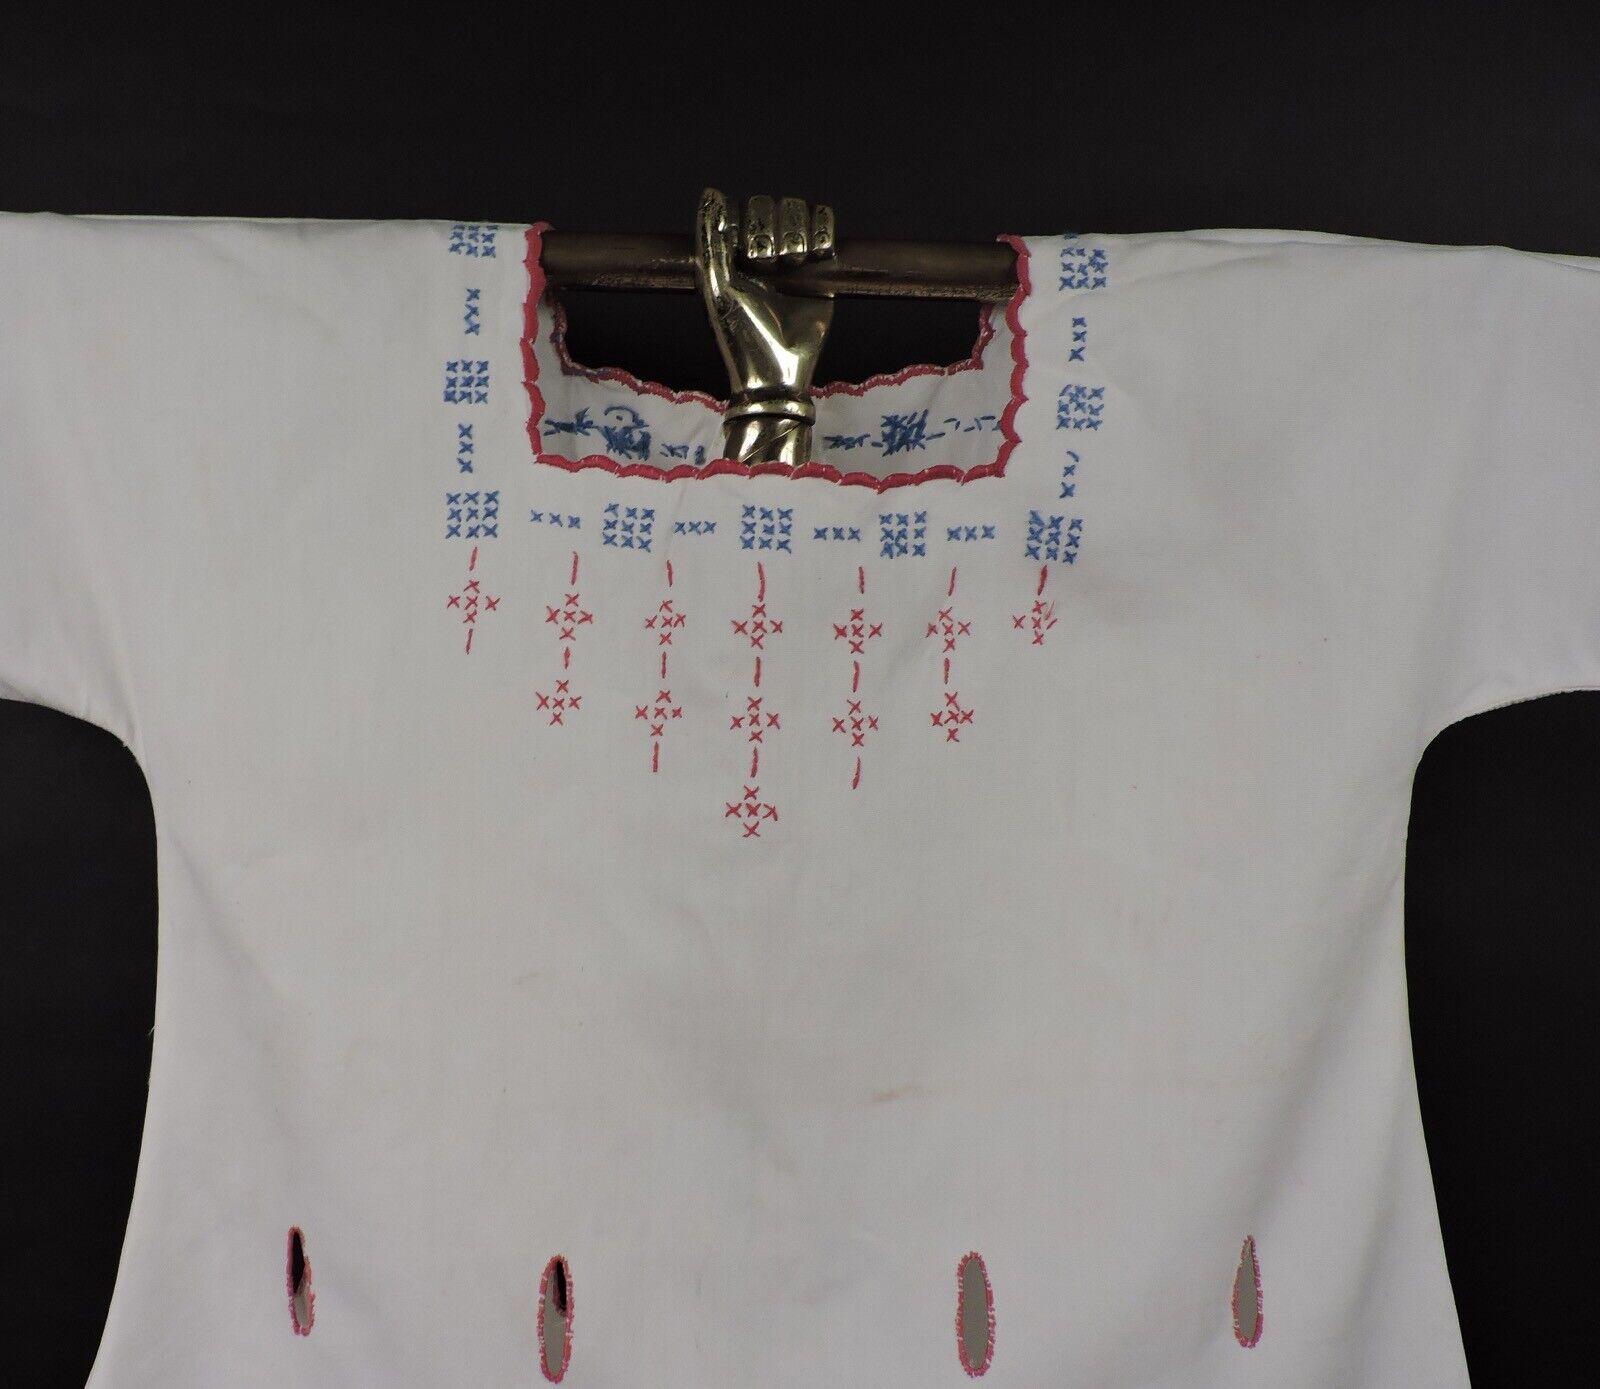 ANTIQUE EDWARDIAN HAND EMBROIDERED CHILD'S DRESS … - image 2